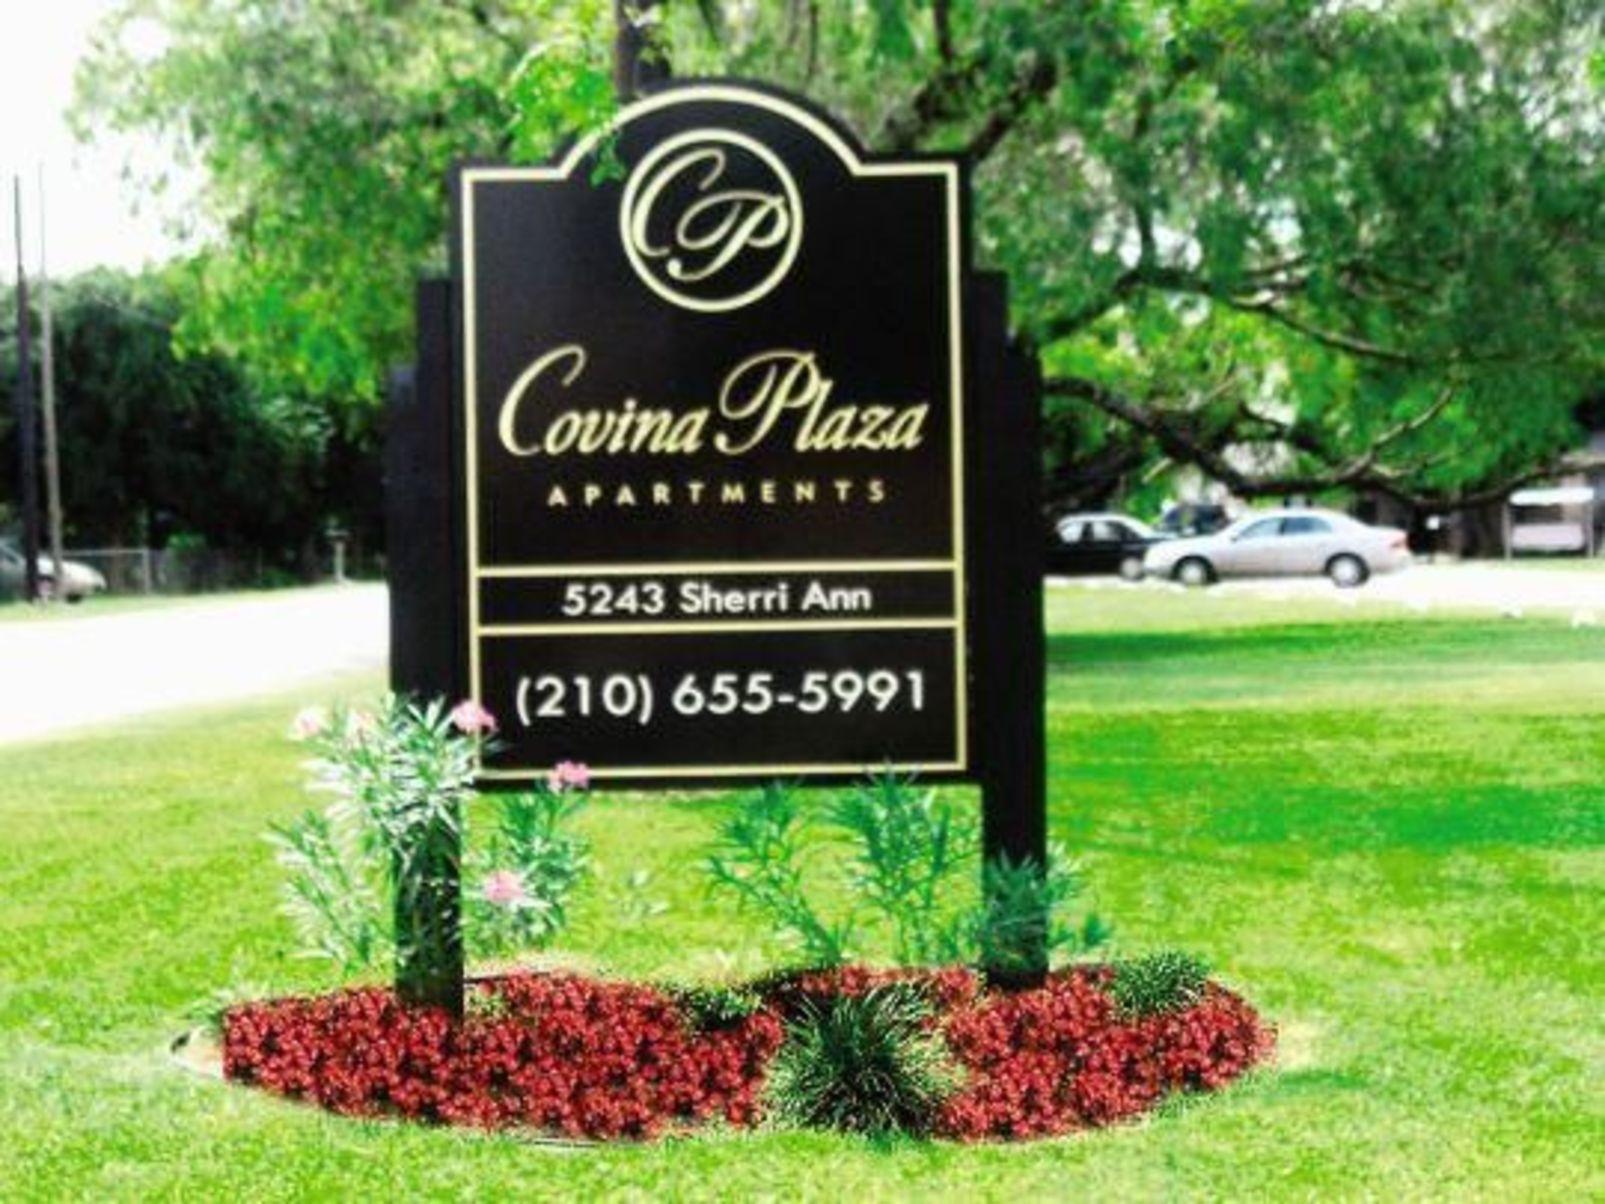 5243 Sherri Ann, San Antonio, Texas 78233, ,Apartment,For Rent, Sherri Ann ,1030